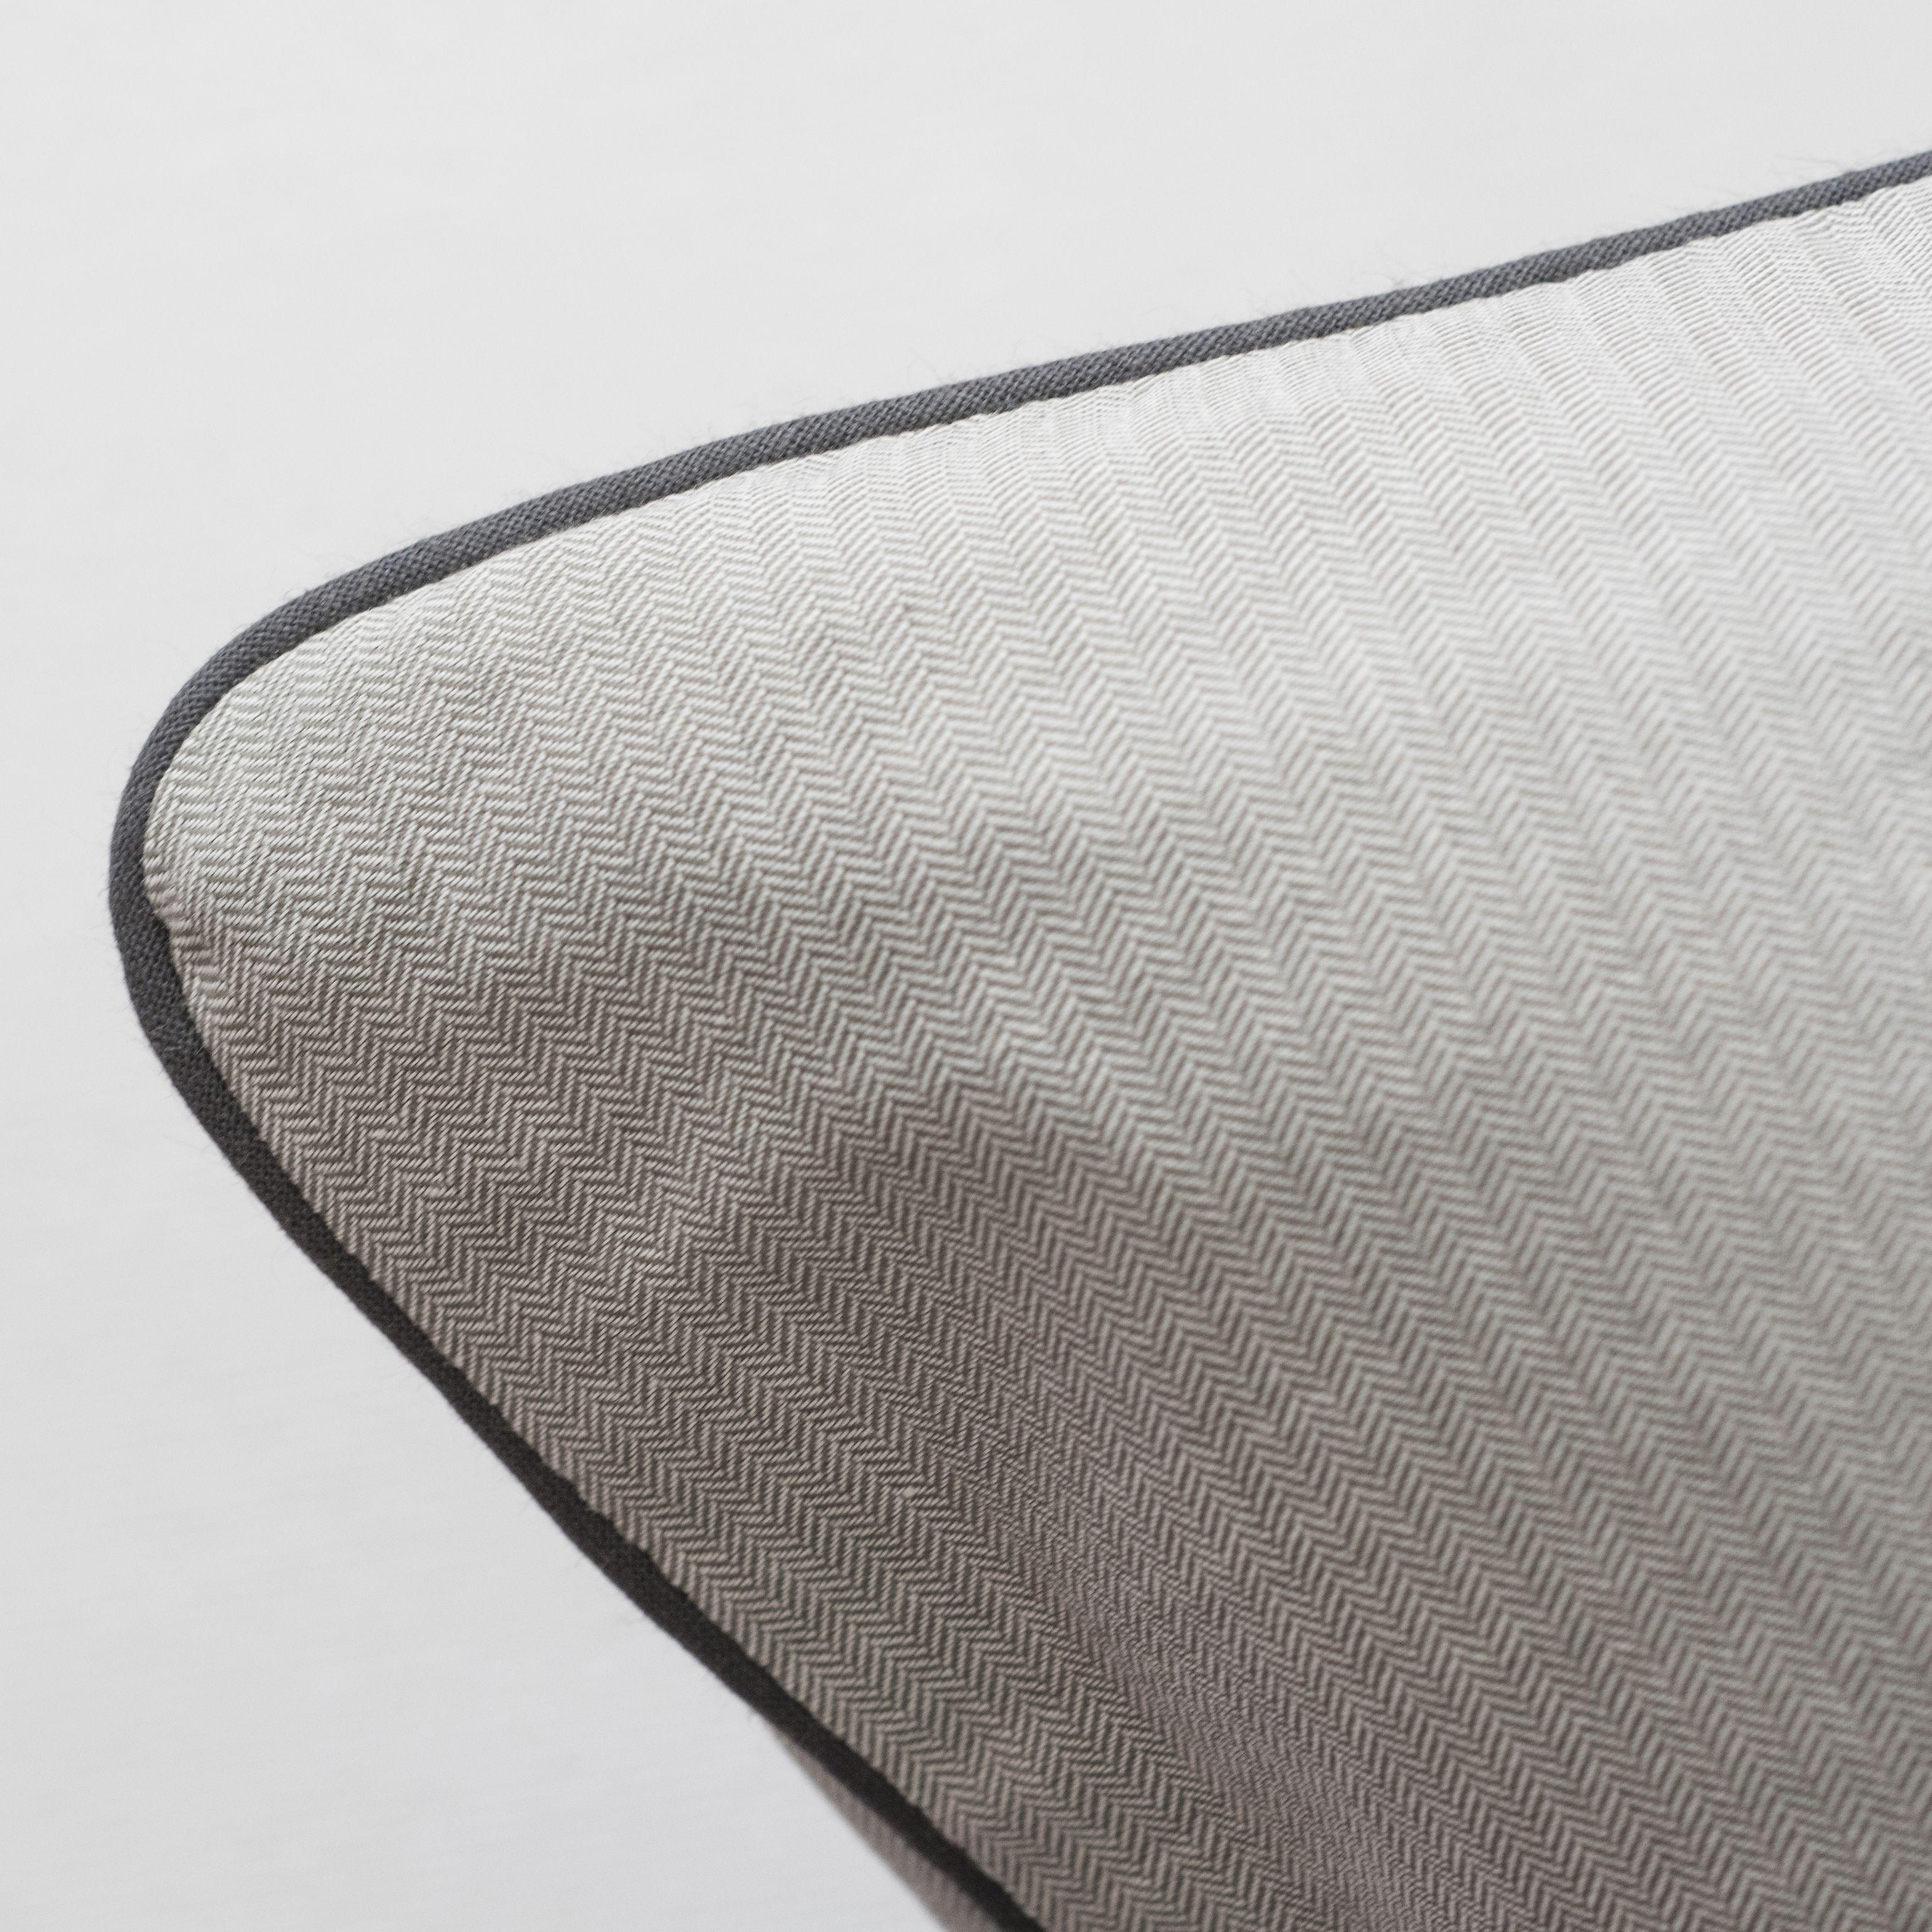 torquato kissenbezug herringbone 40 x 40 cm bei. Black Bedroom Furniture Sets. Home Design Ideas